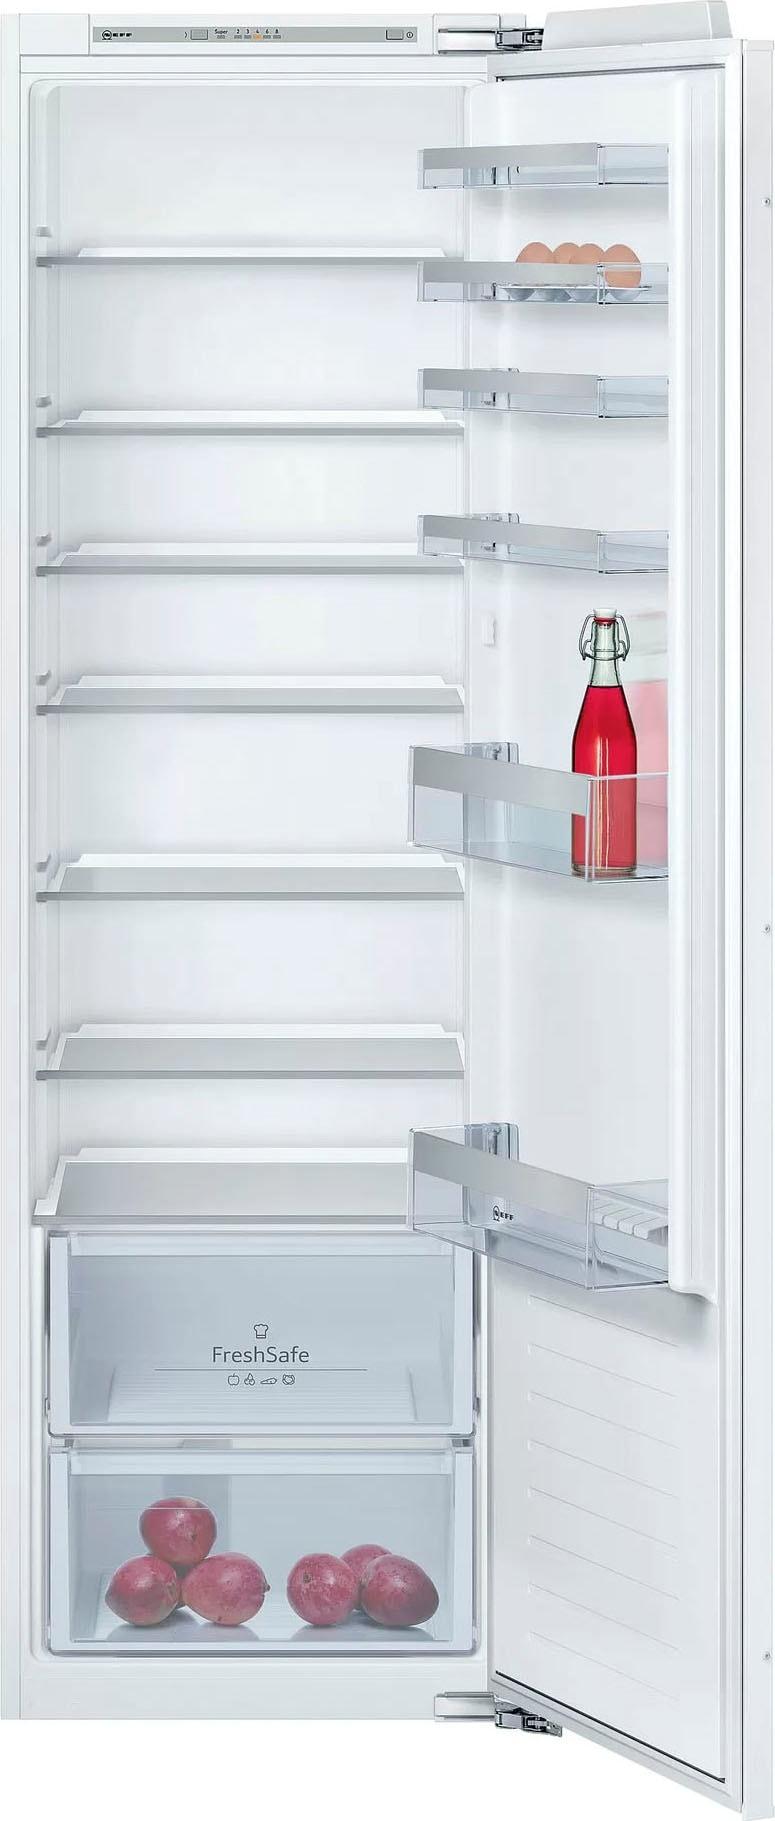 NEFF Einbaukühlschrank KI1812FF0 , N 50